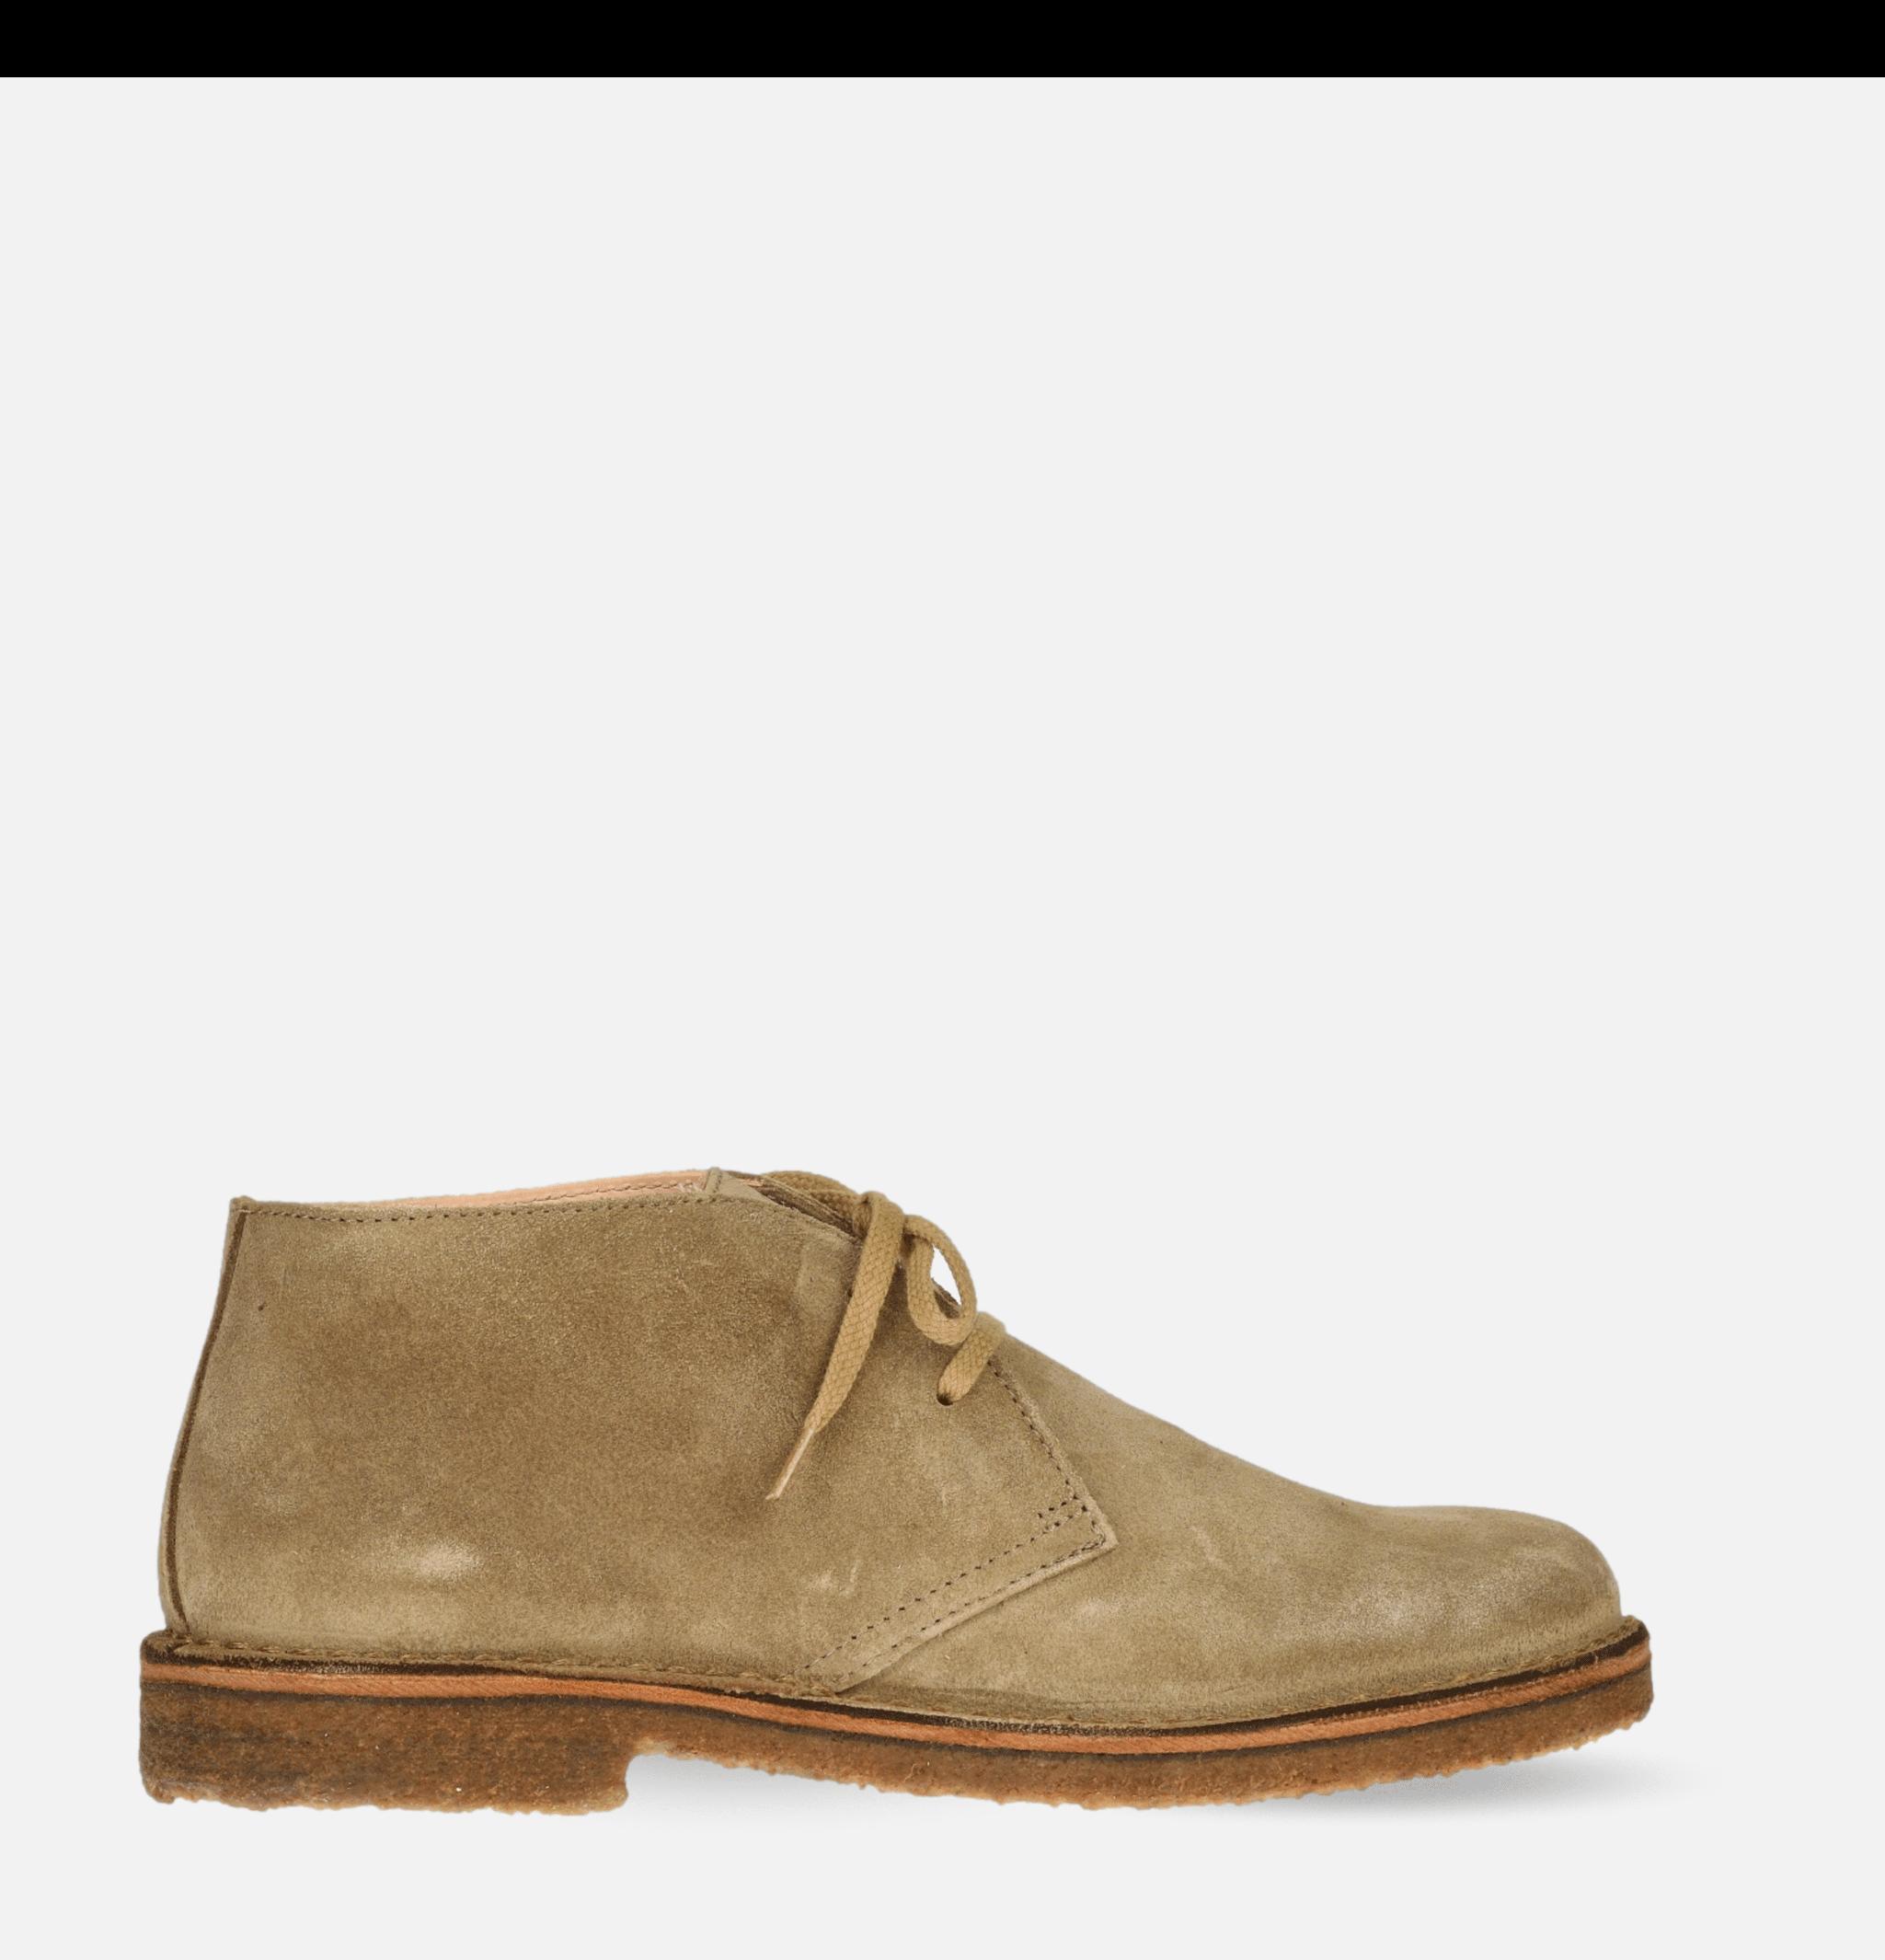 Greenflex Boots Stone